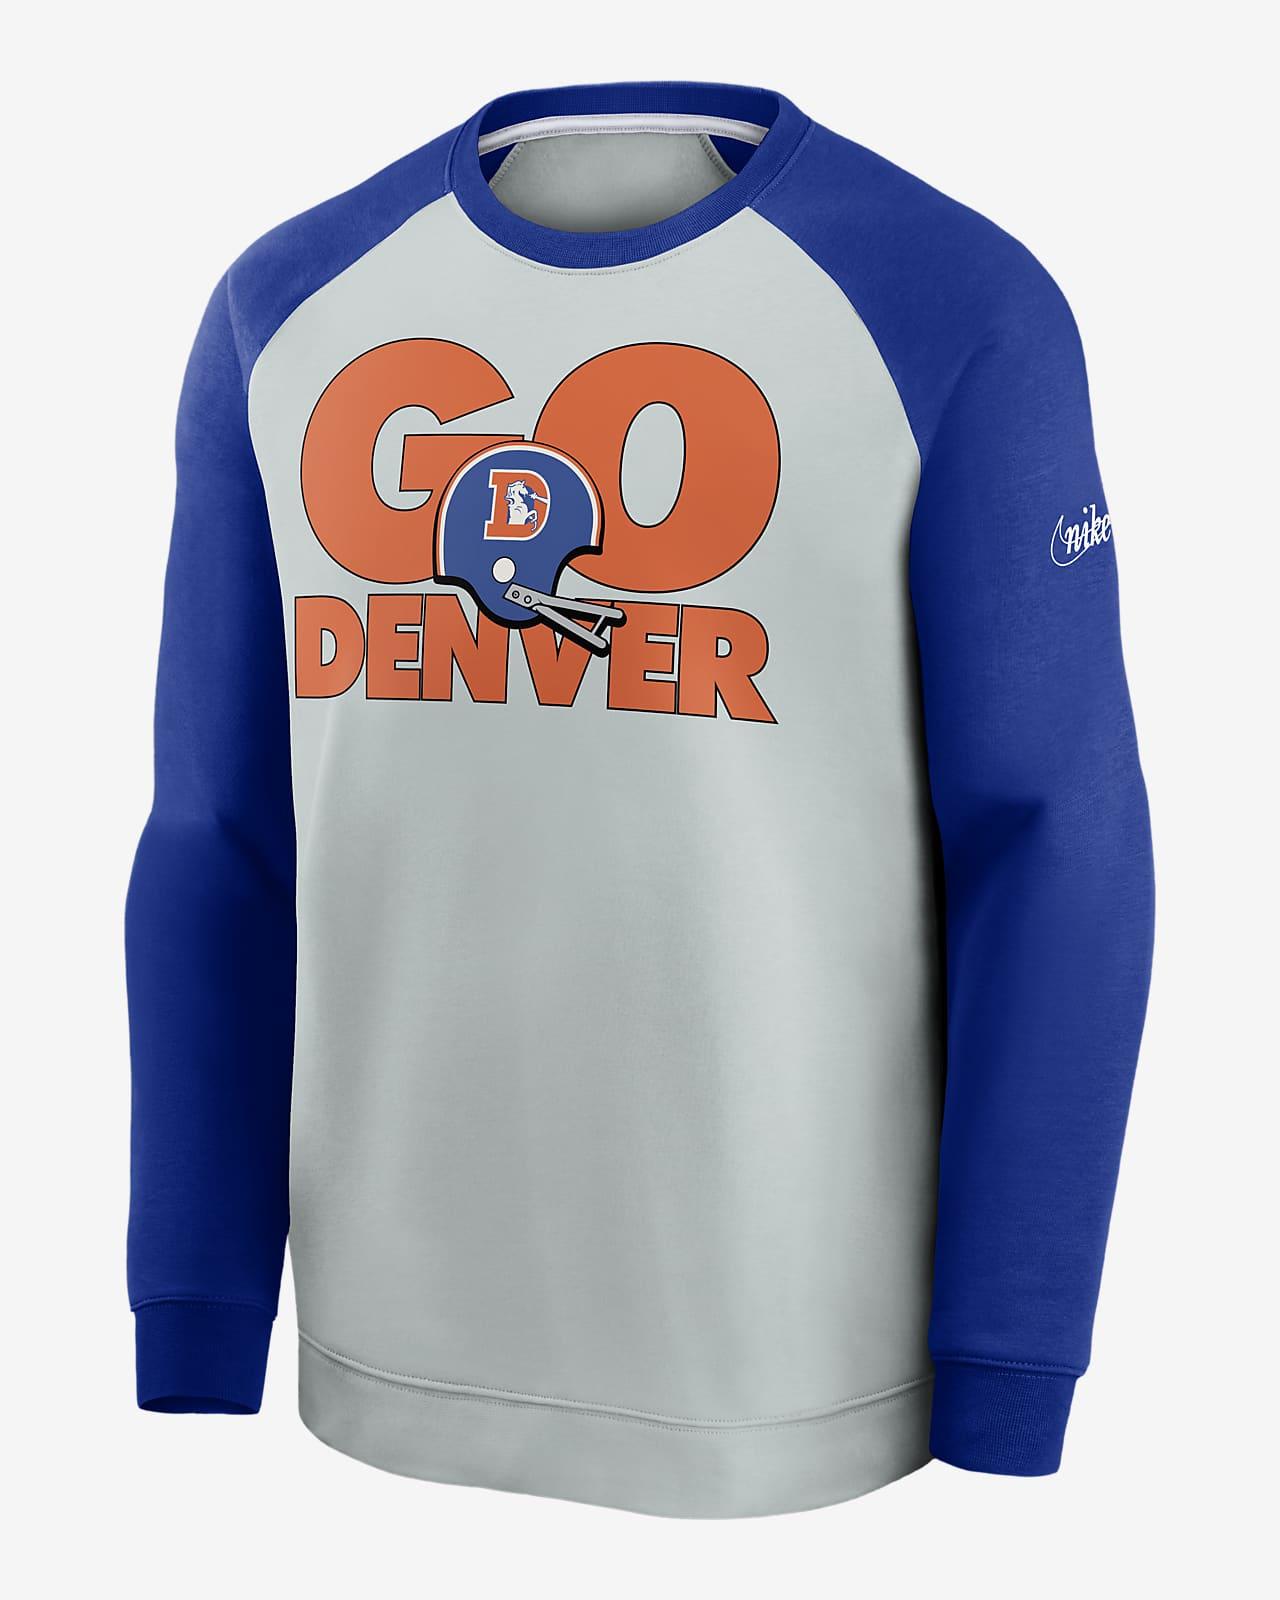 Nike Historic Raglan (NFL Broncos) Men's Sweatshirt